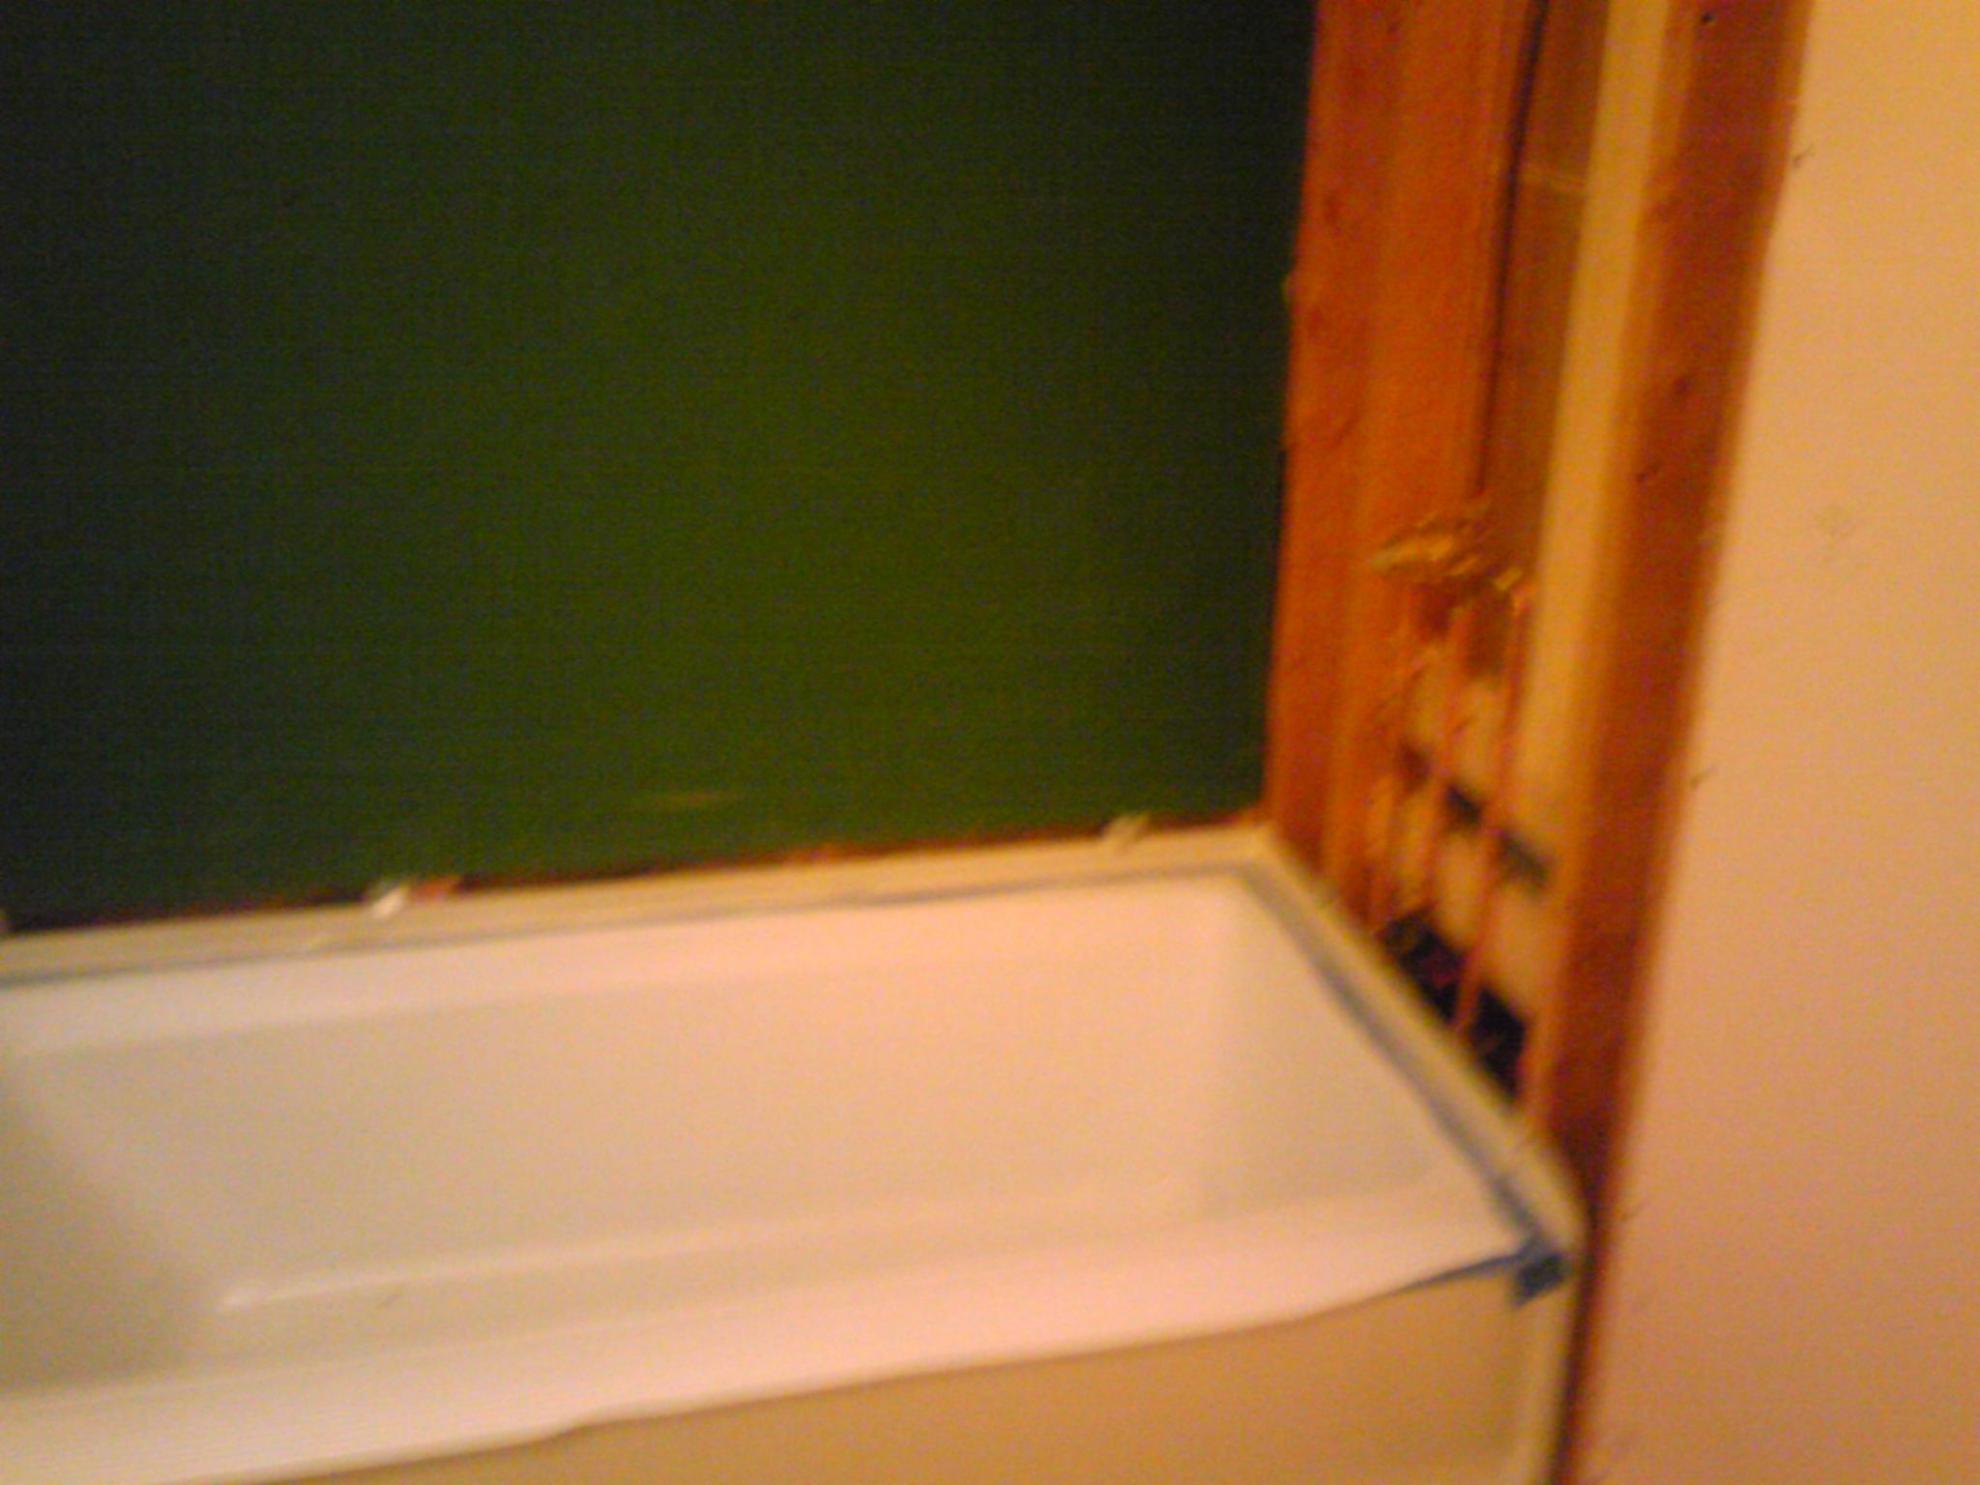 tiling walls on a tub-day-job-pics-003.jpg